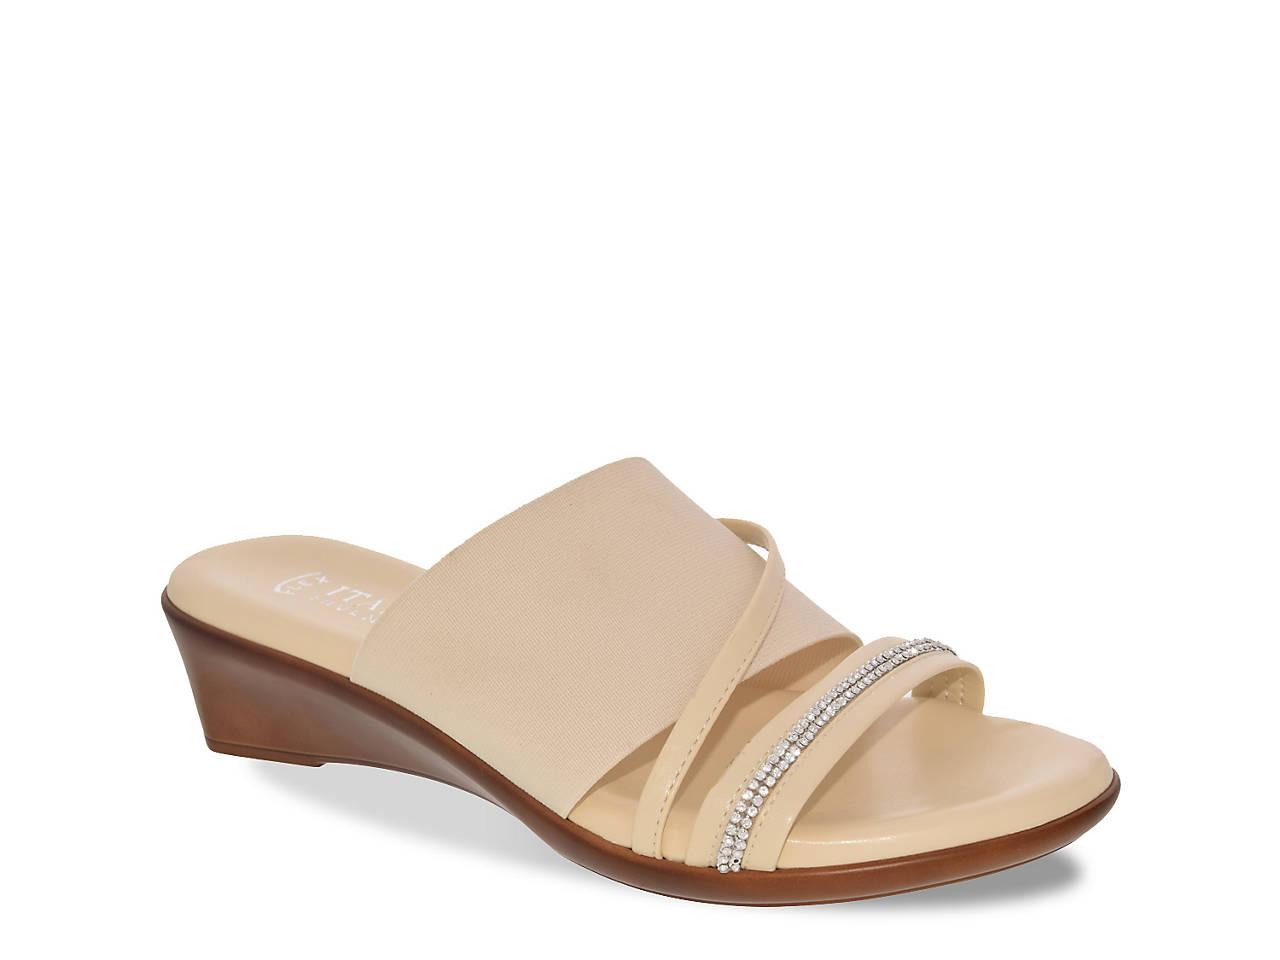 a2fd2d956 Italian Shoemakers Sassy Wedge Sandal Women s Shoes